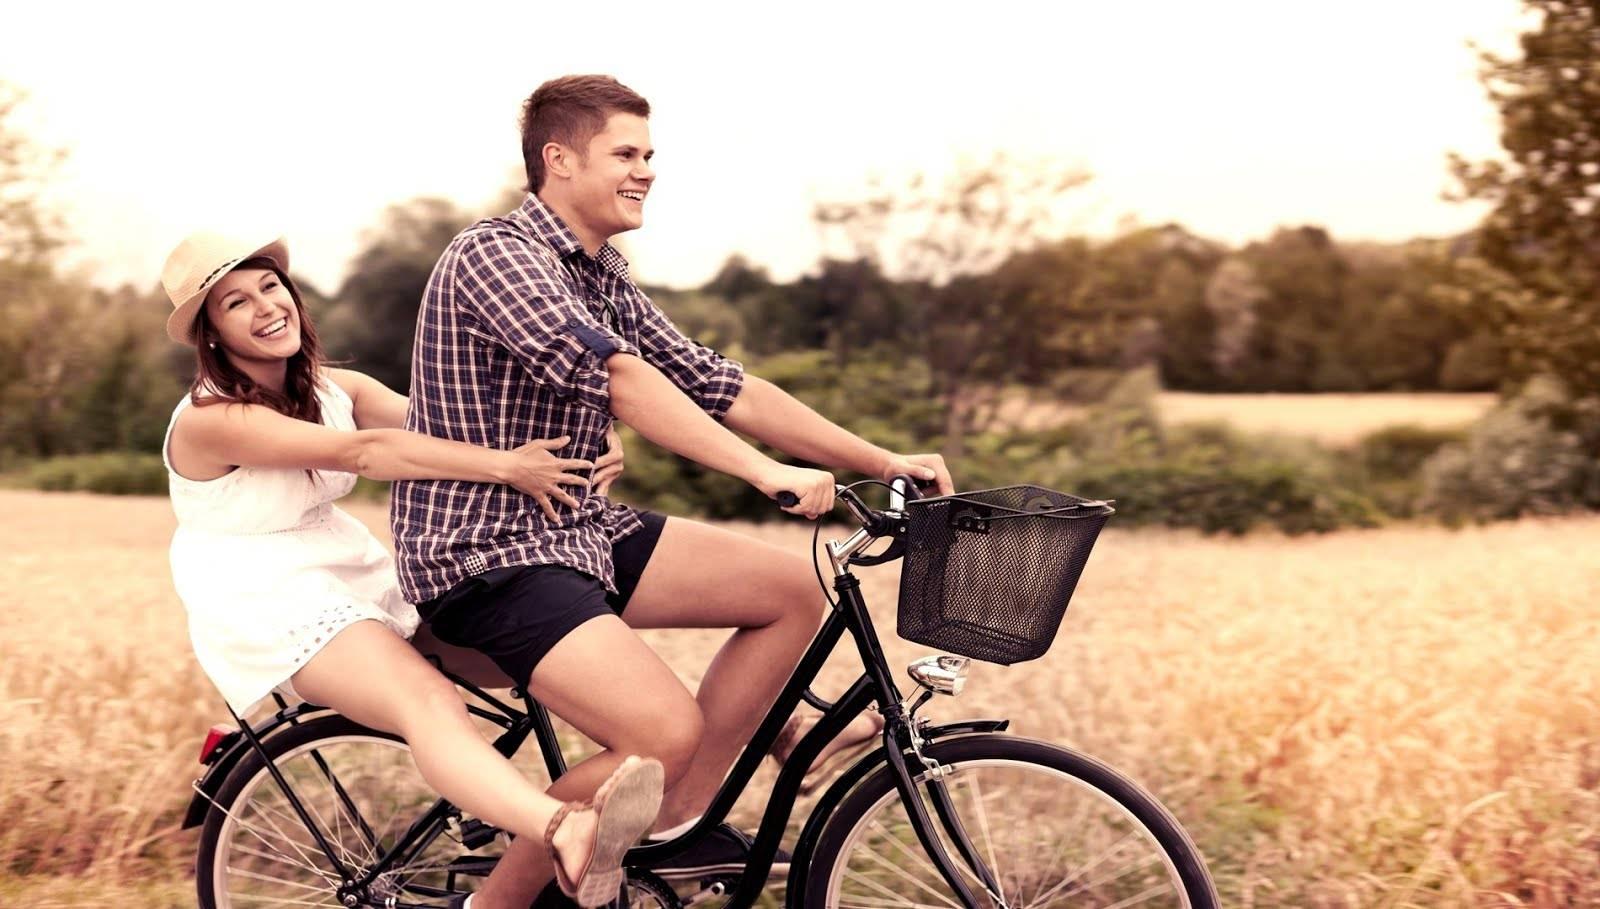 Couple riding a bike having fun